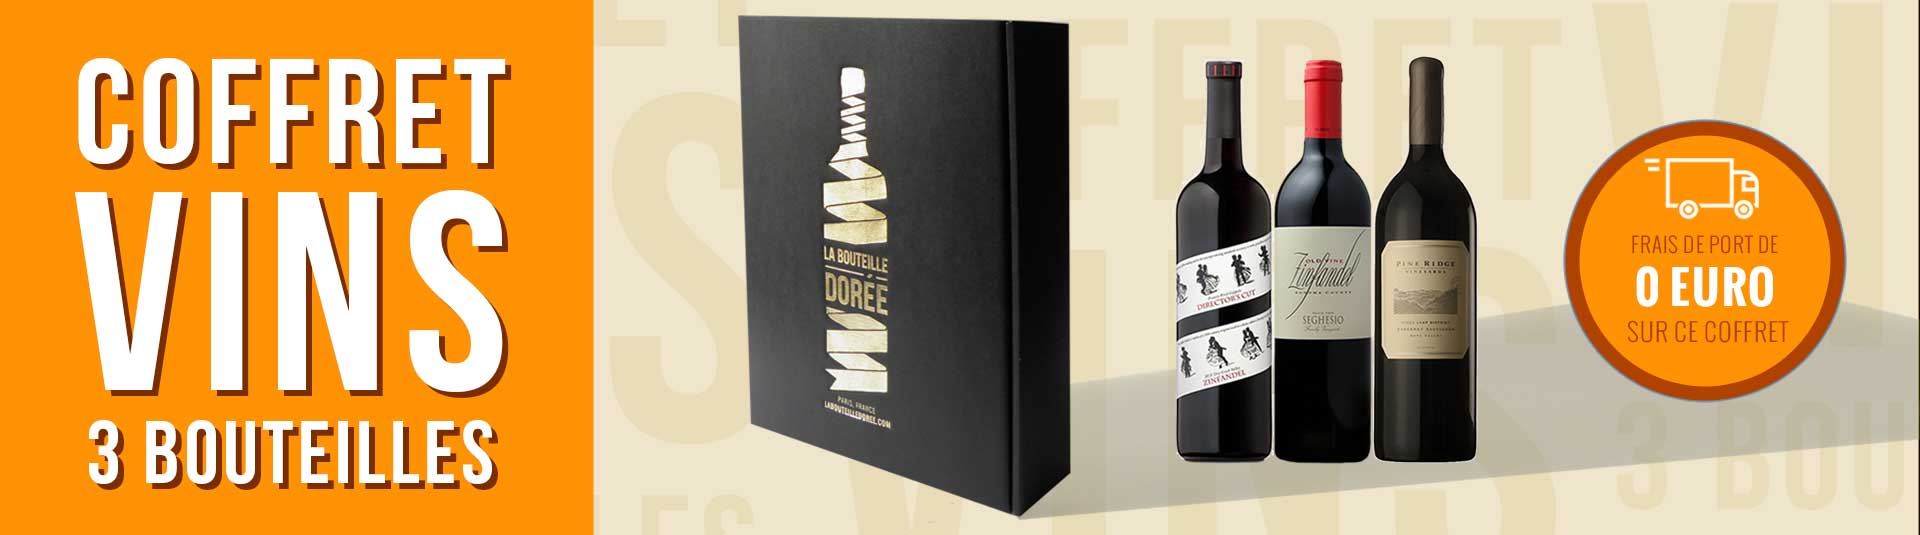 Coffret vin USA Prestige 3 bouteilles